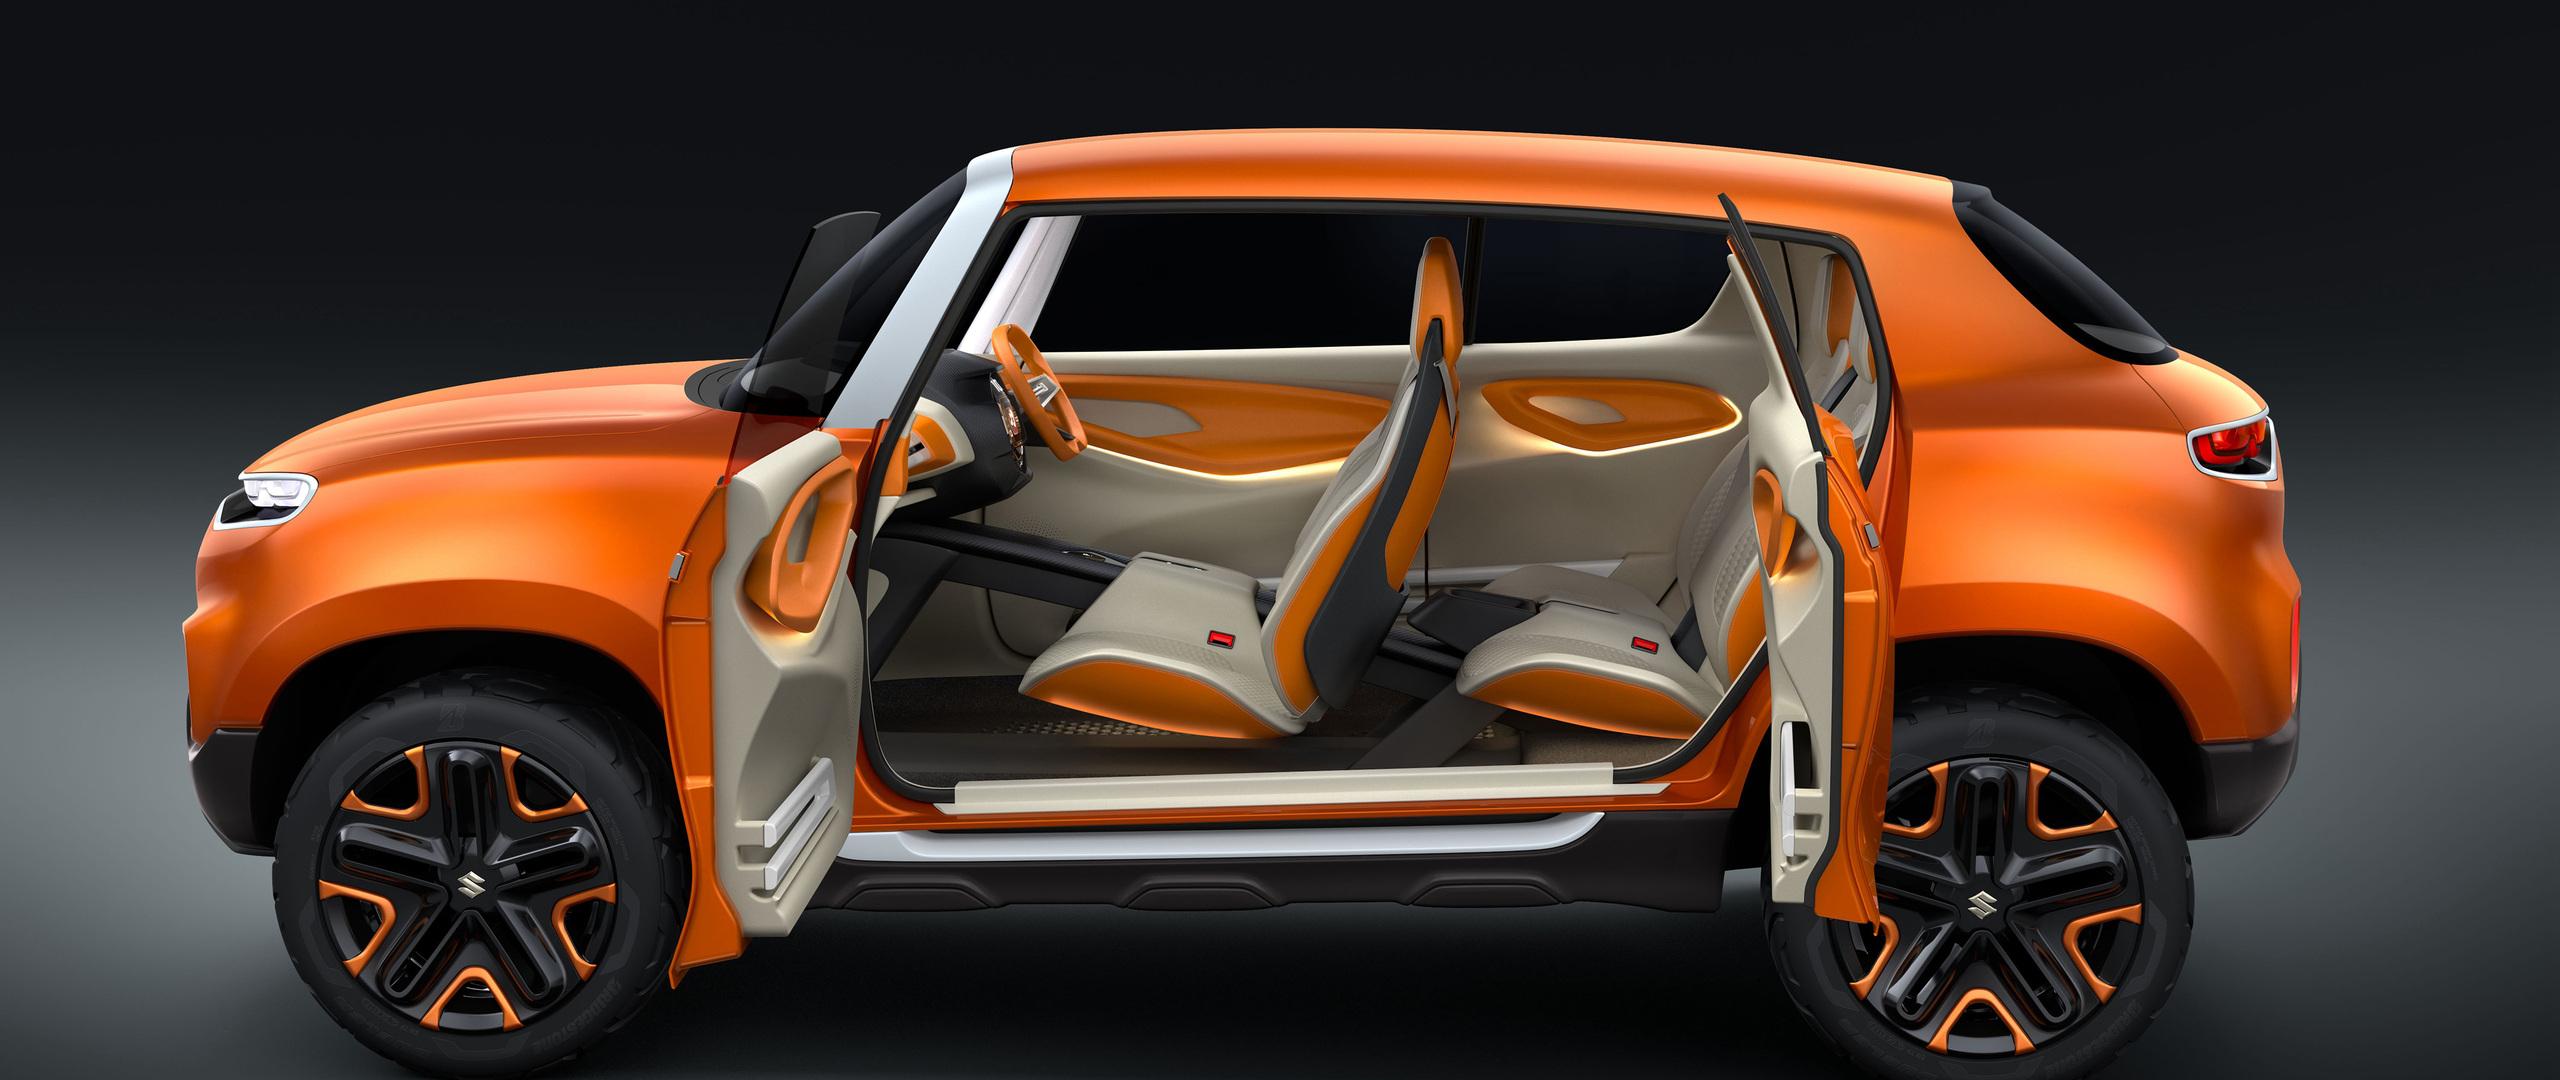 suzuki-concept-future-s-interior-mu.jpg